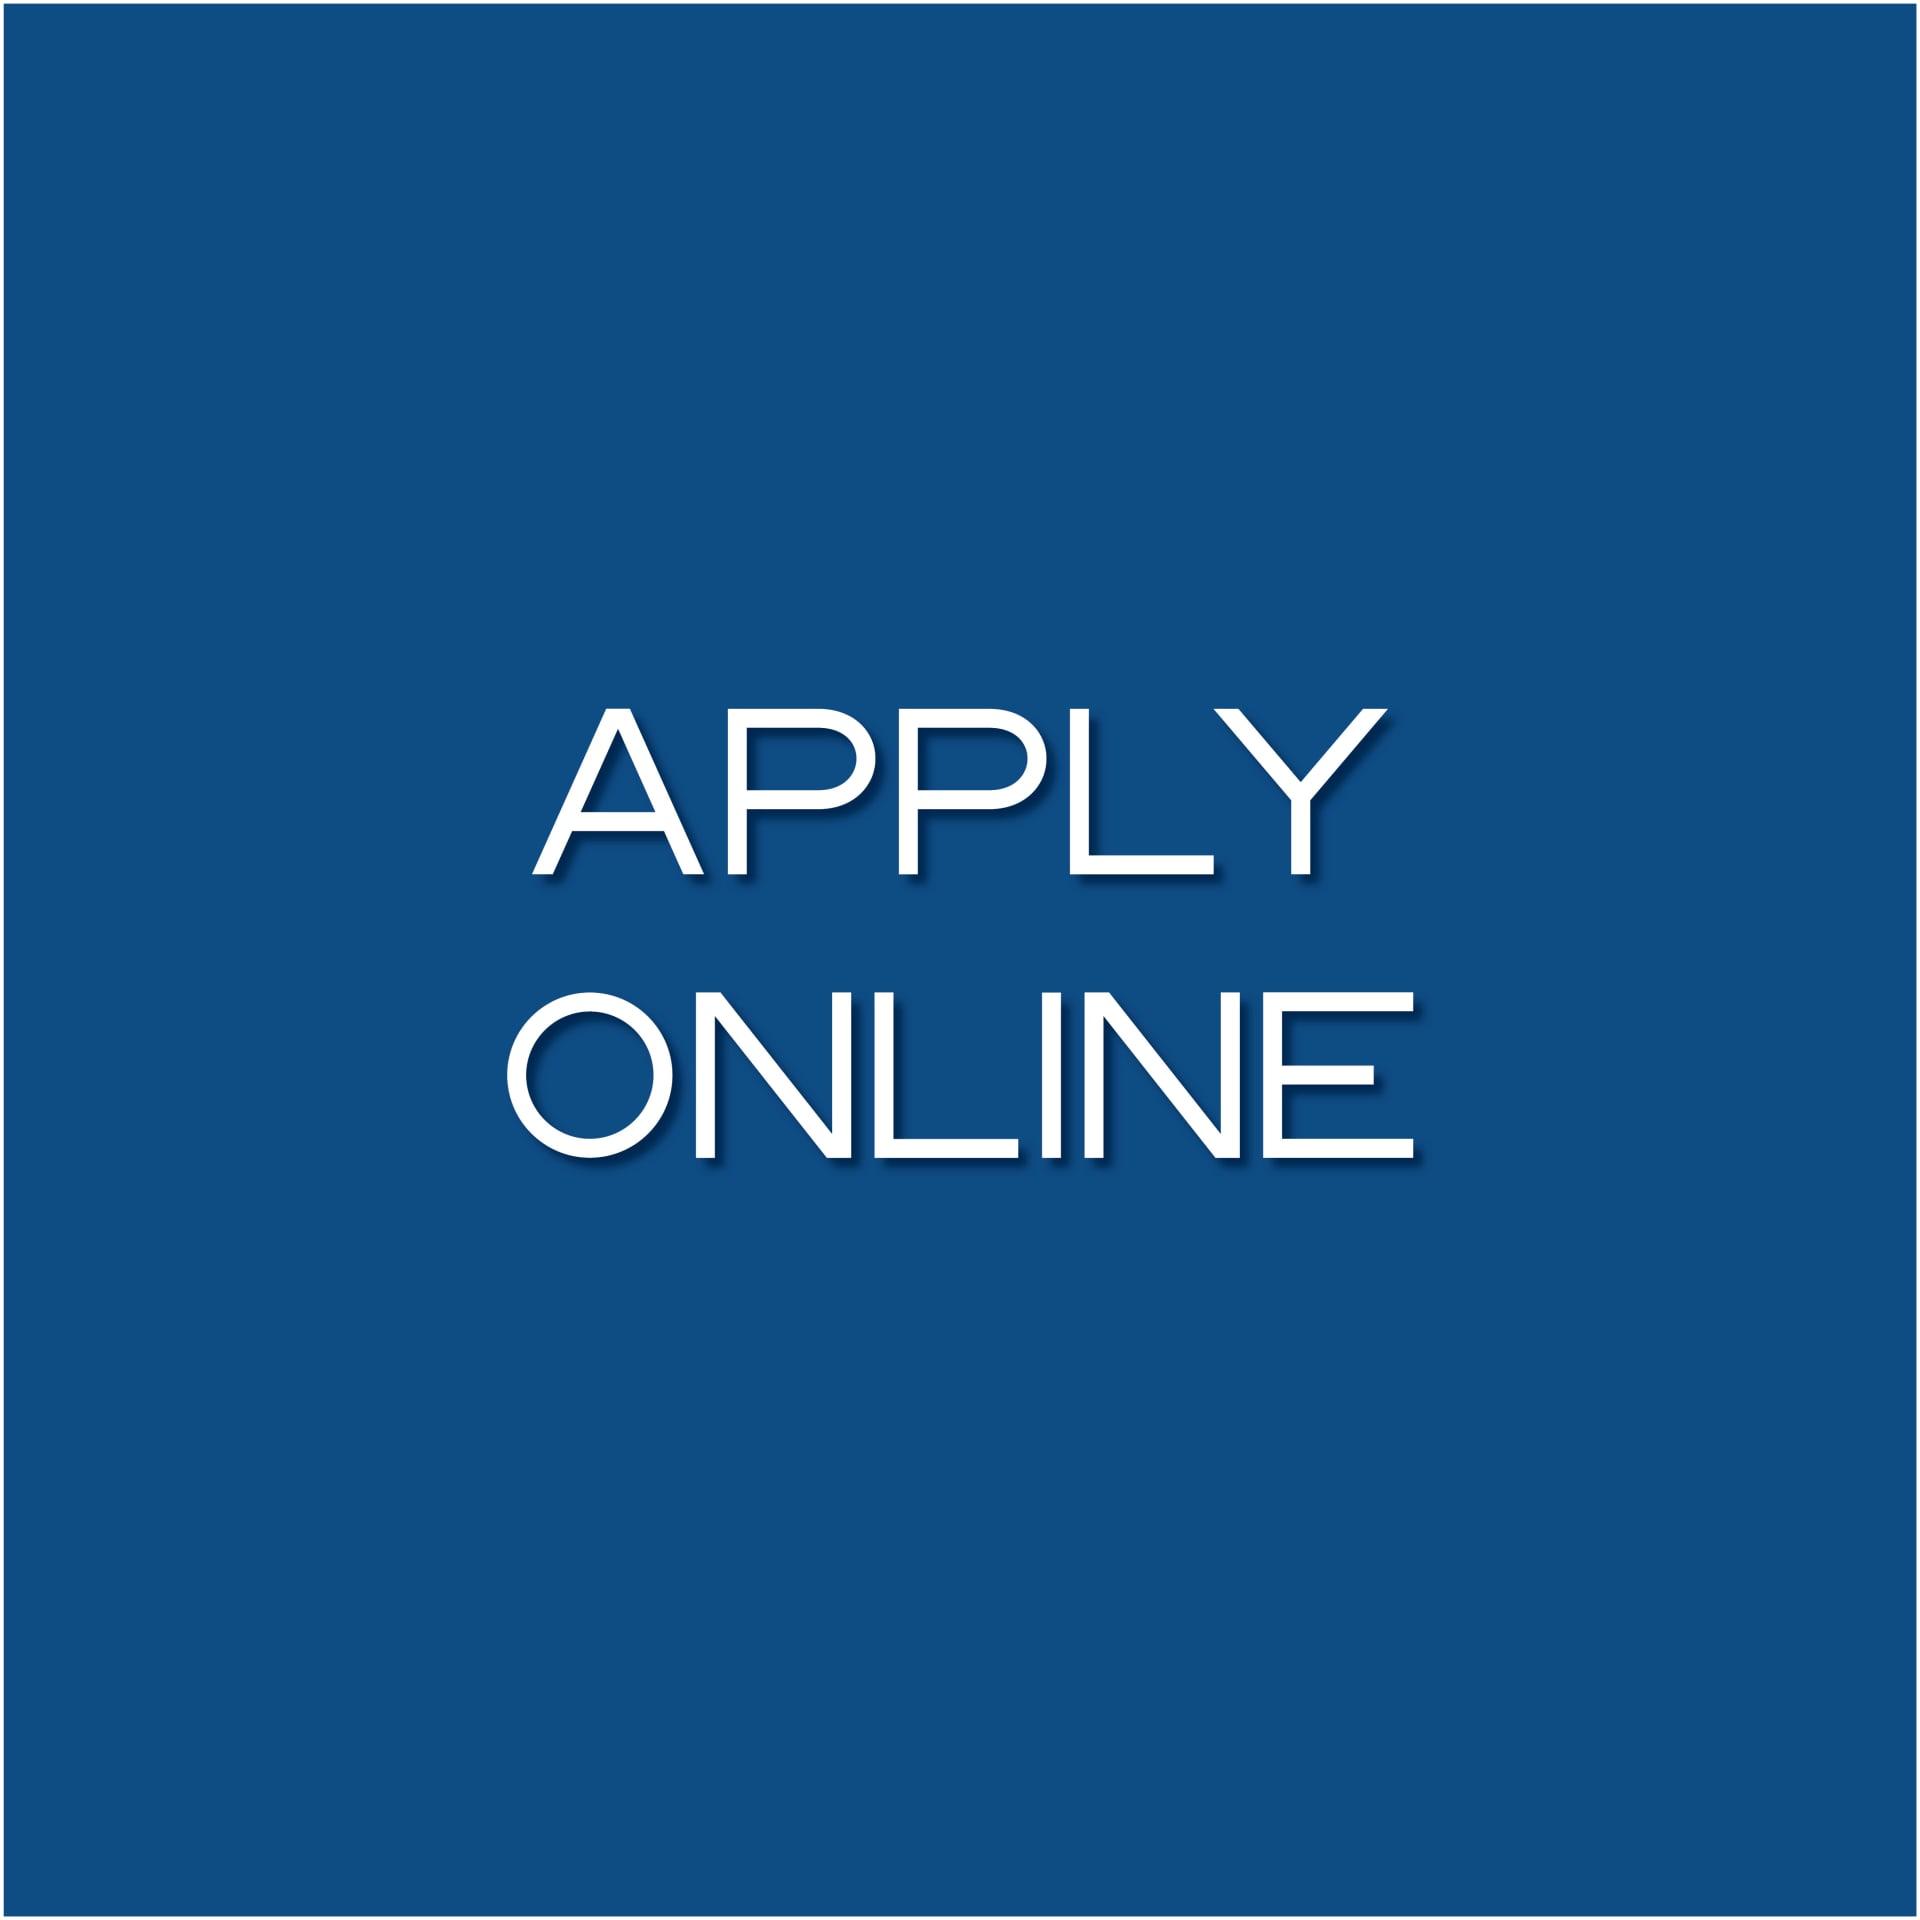 Apply Online Button